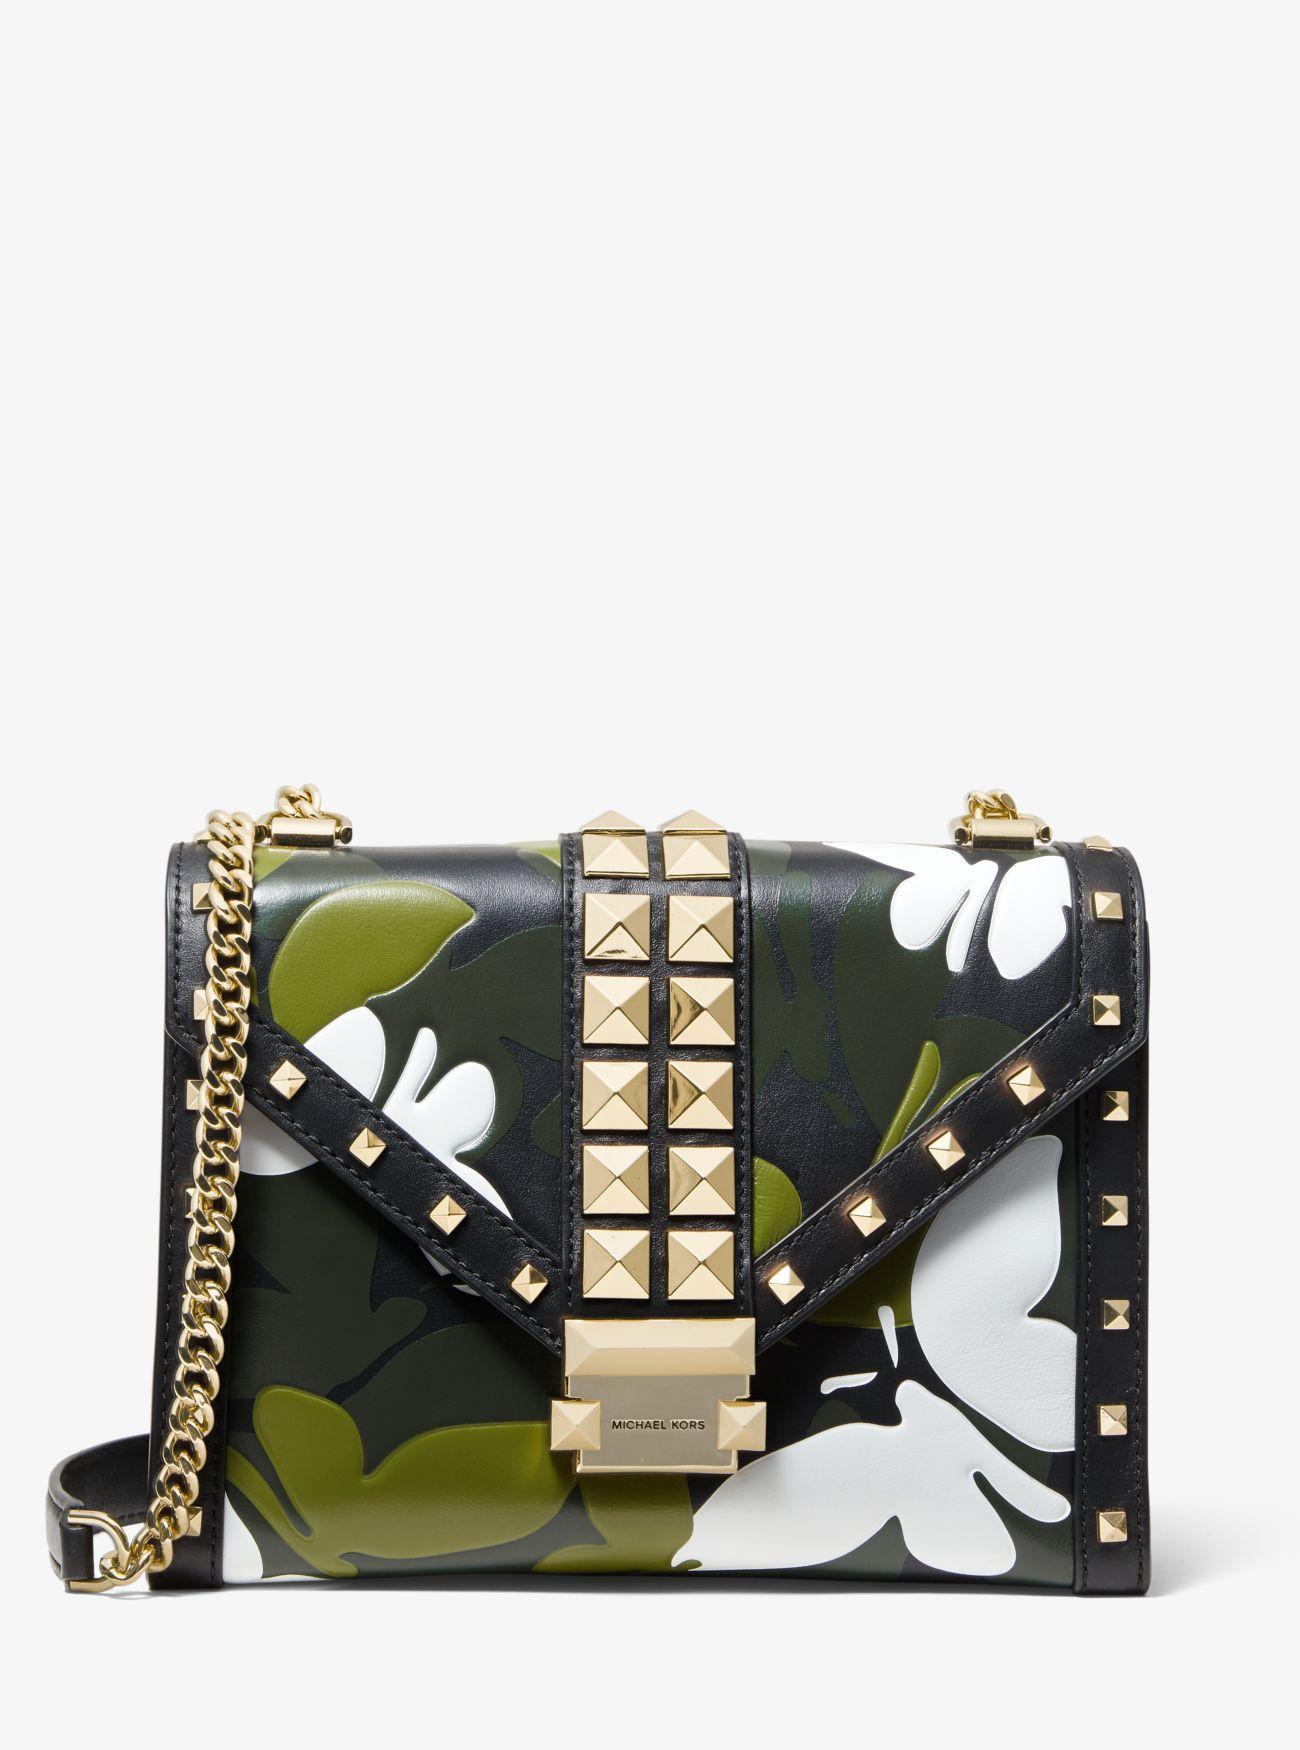 6e5315b121f4 MICHAEL Michael Kors. Women s Black Whitney Large Butterfly Camo  Convertible Shoulder Bag